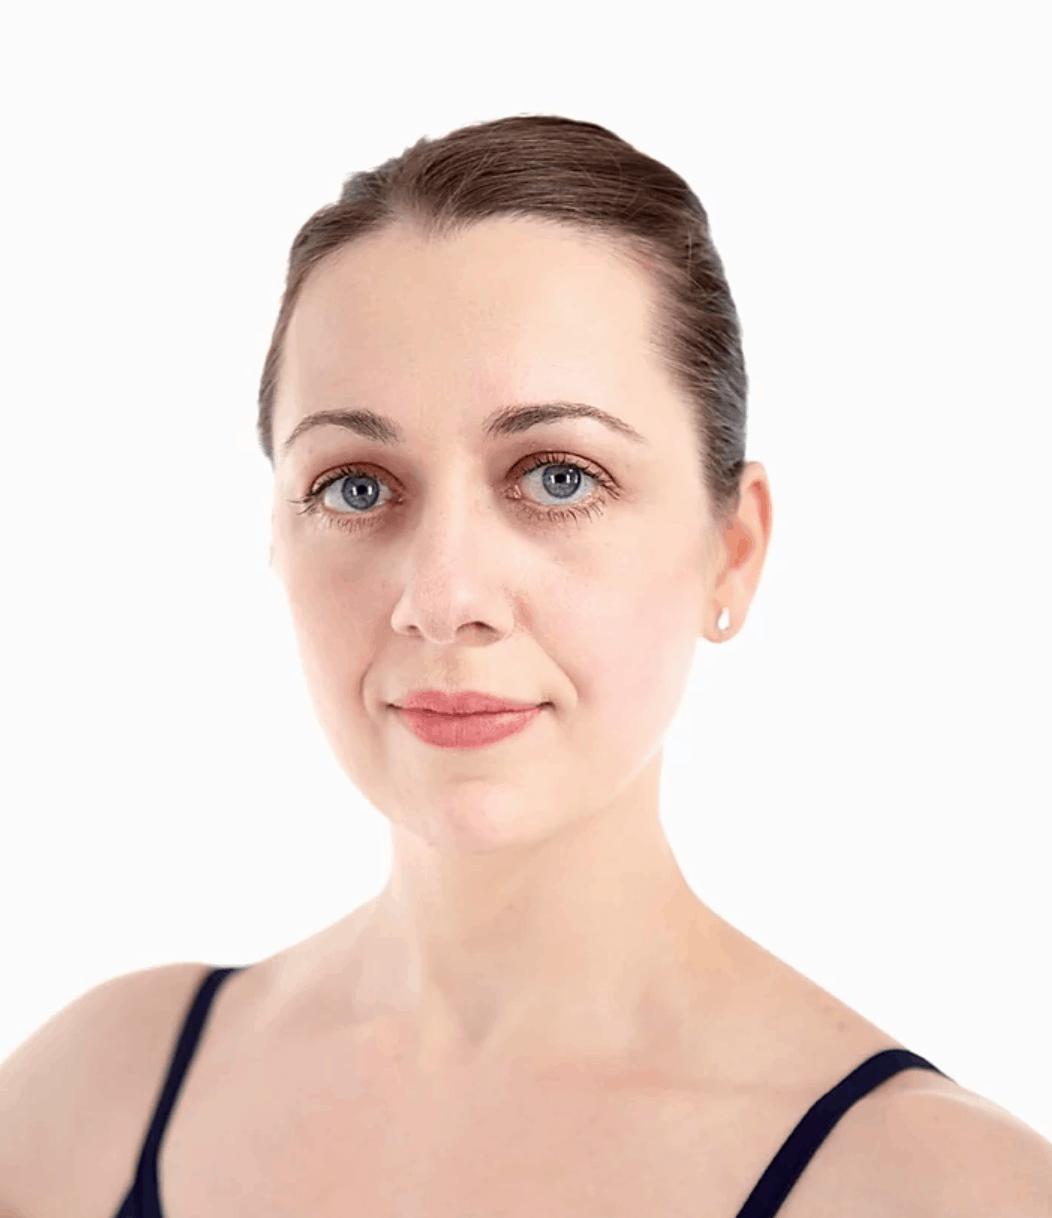 Franziska Rosenzweig, Holistic Ballet & Pointe Work Technique teacher at Danceworks in London